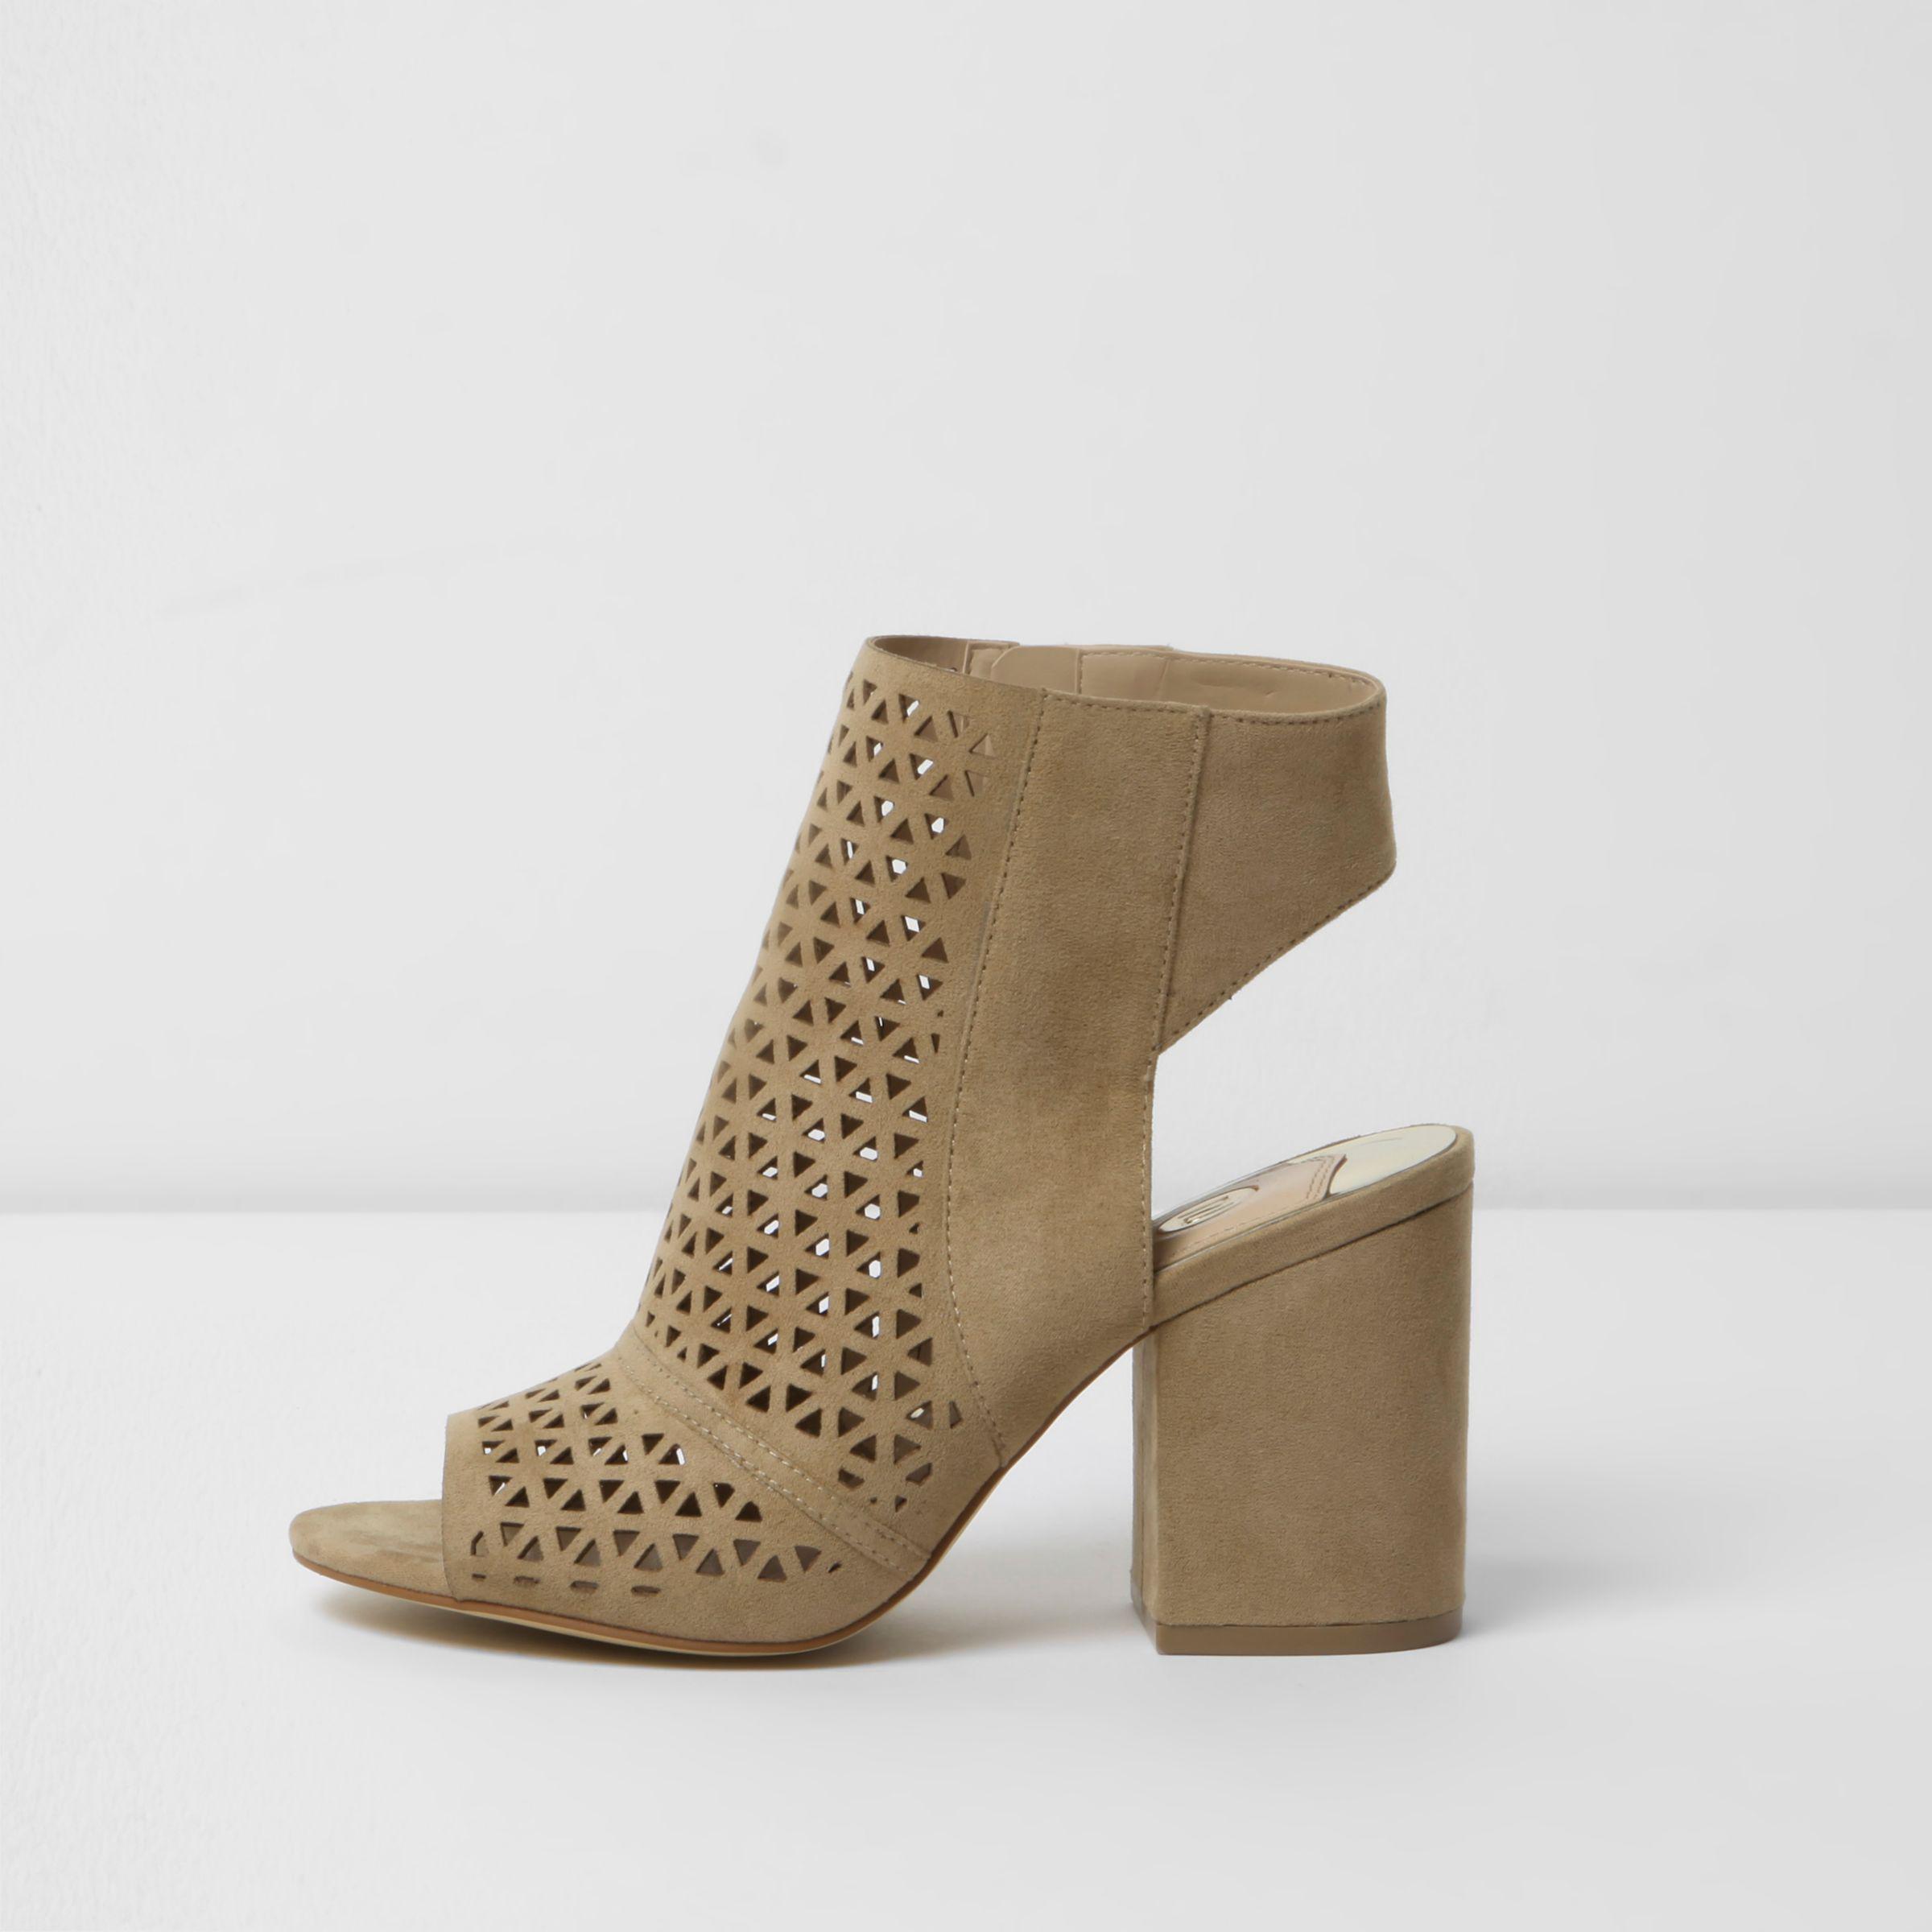 Fake Womens Beige laser cut peep toe shoe boots River Island Cheap Free Shipping Genuine Online Discount 2018 New rokkv5l